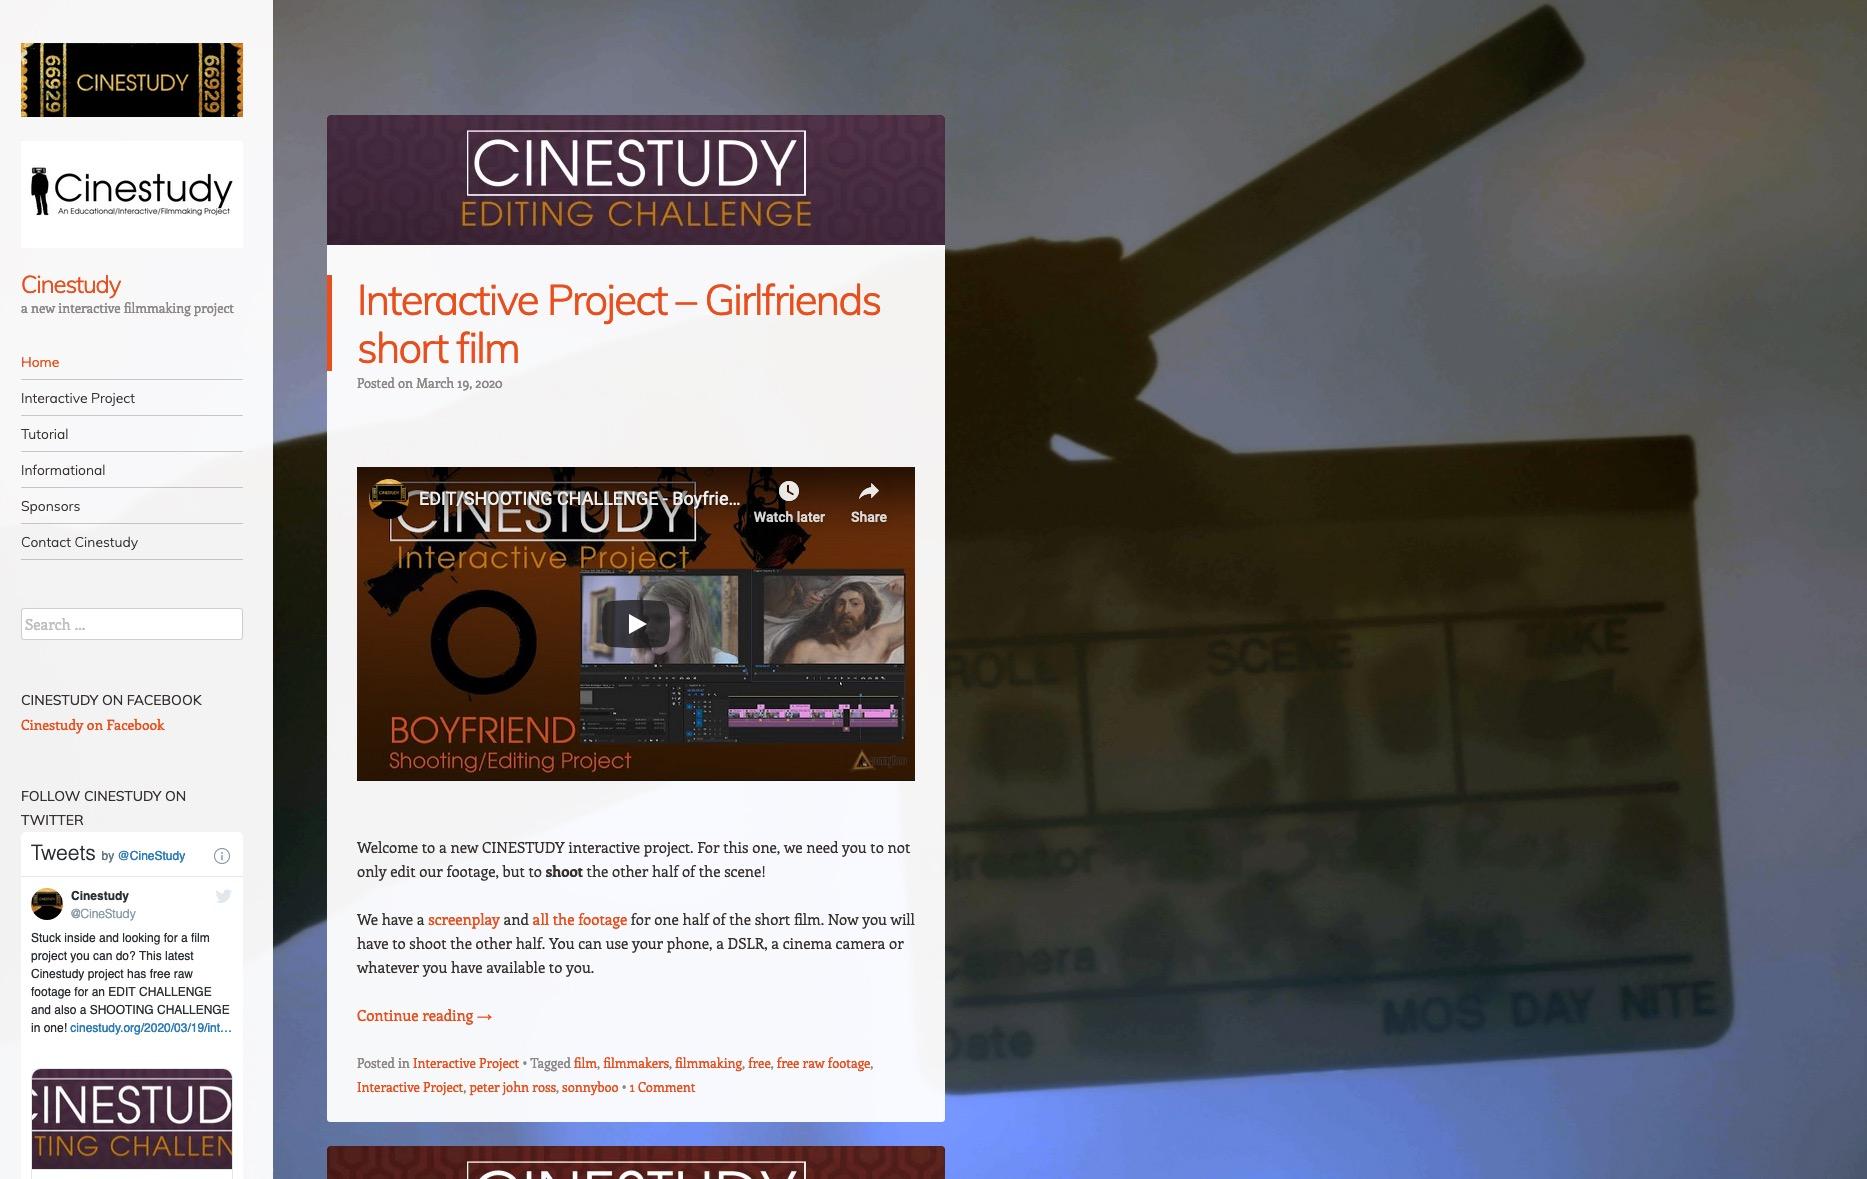 Cinestudy splashscreen